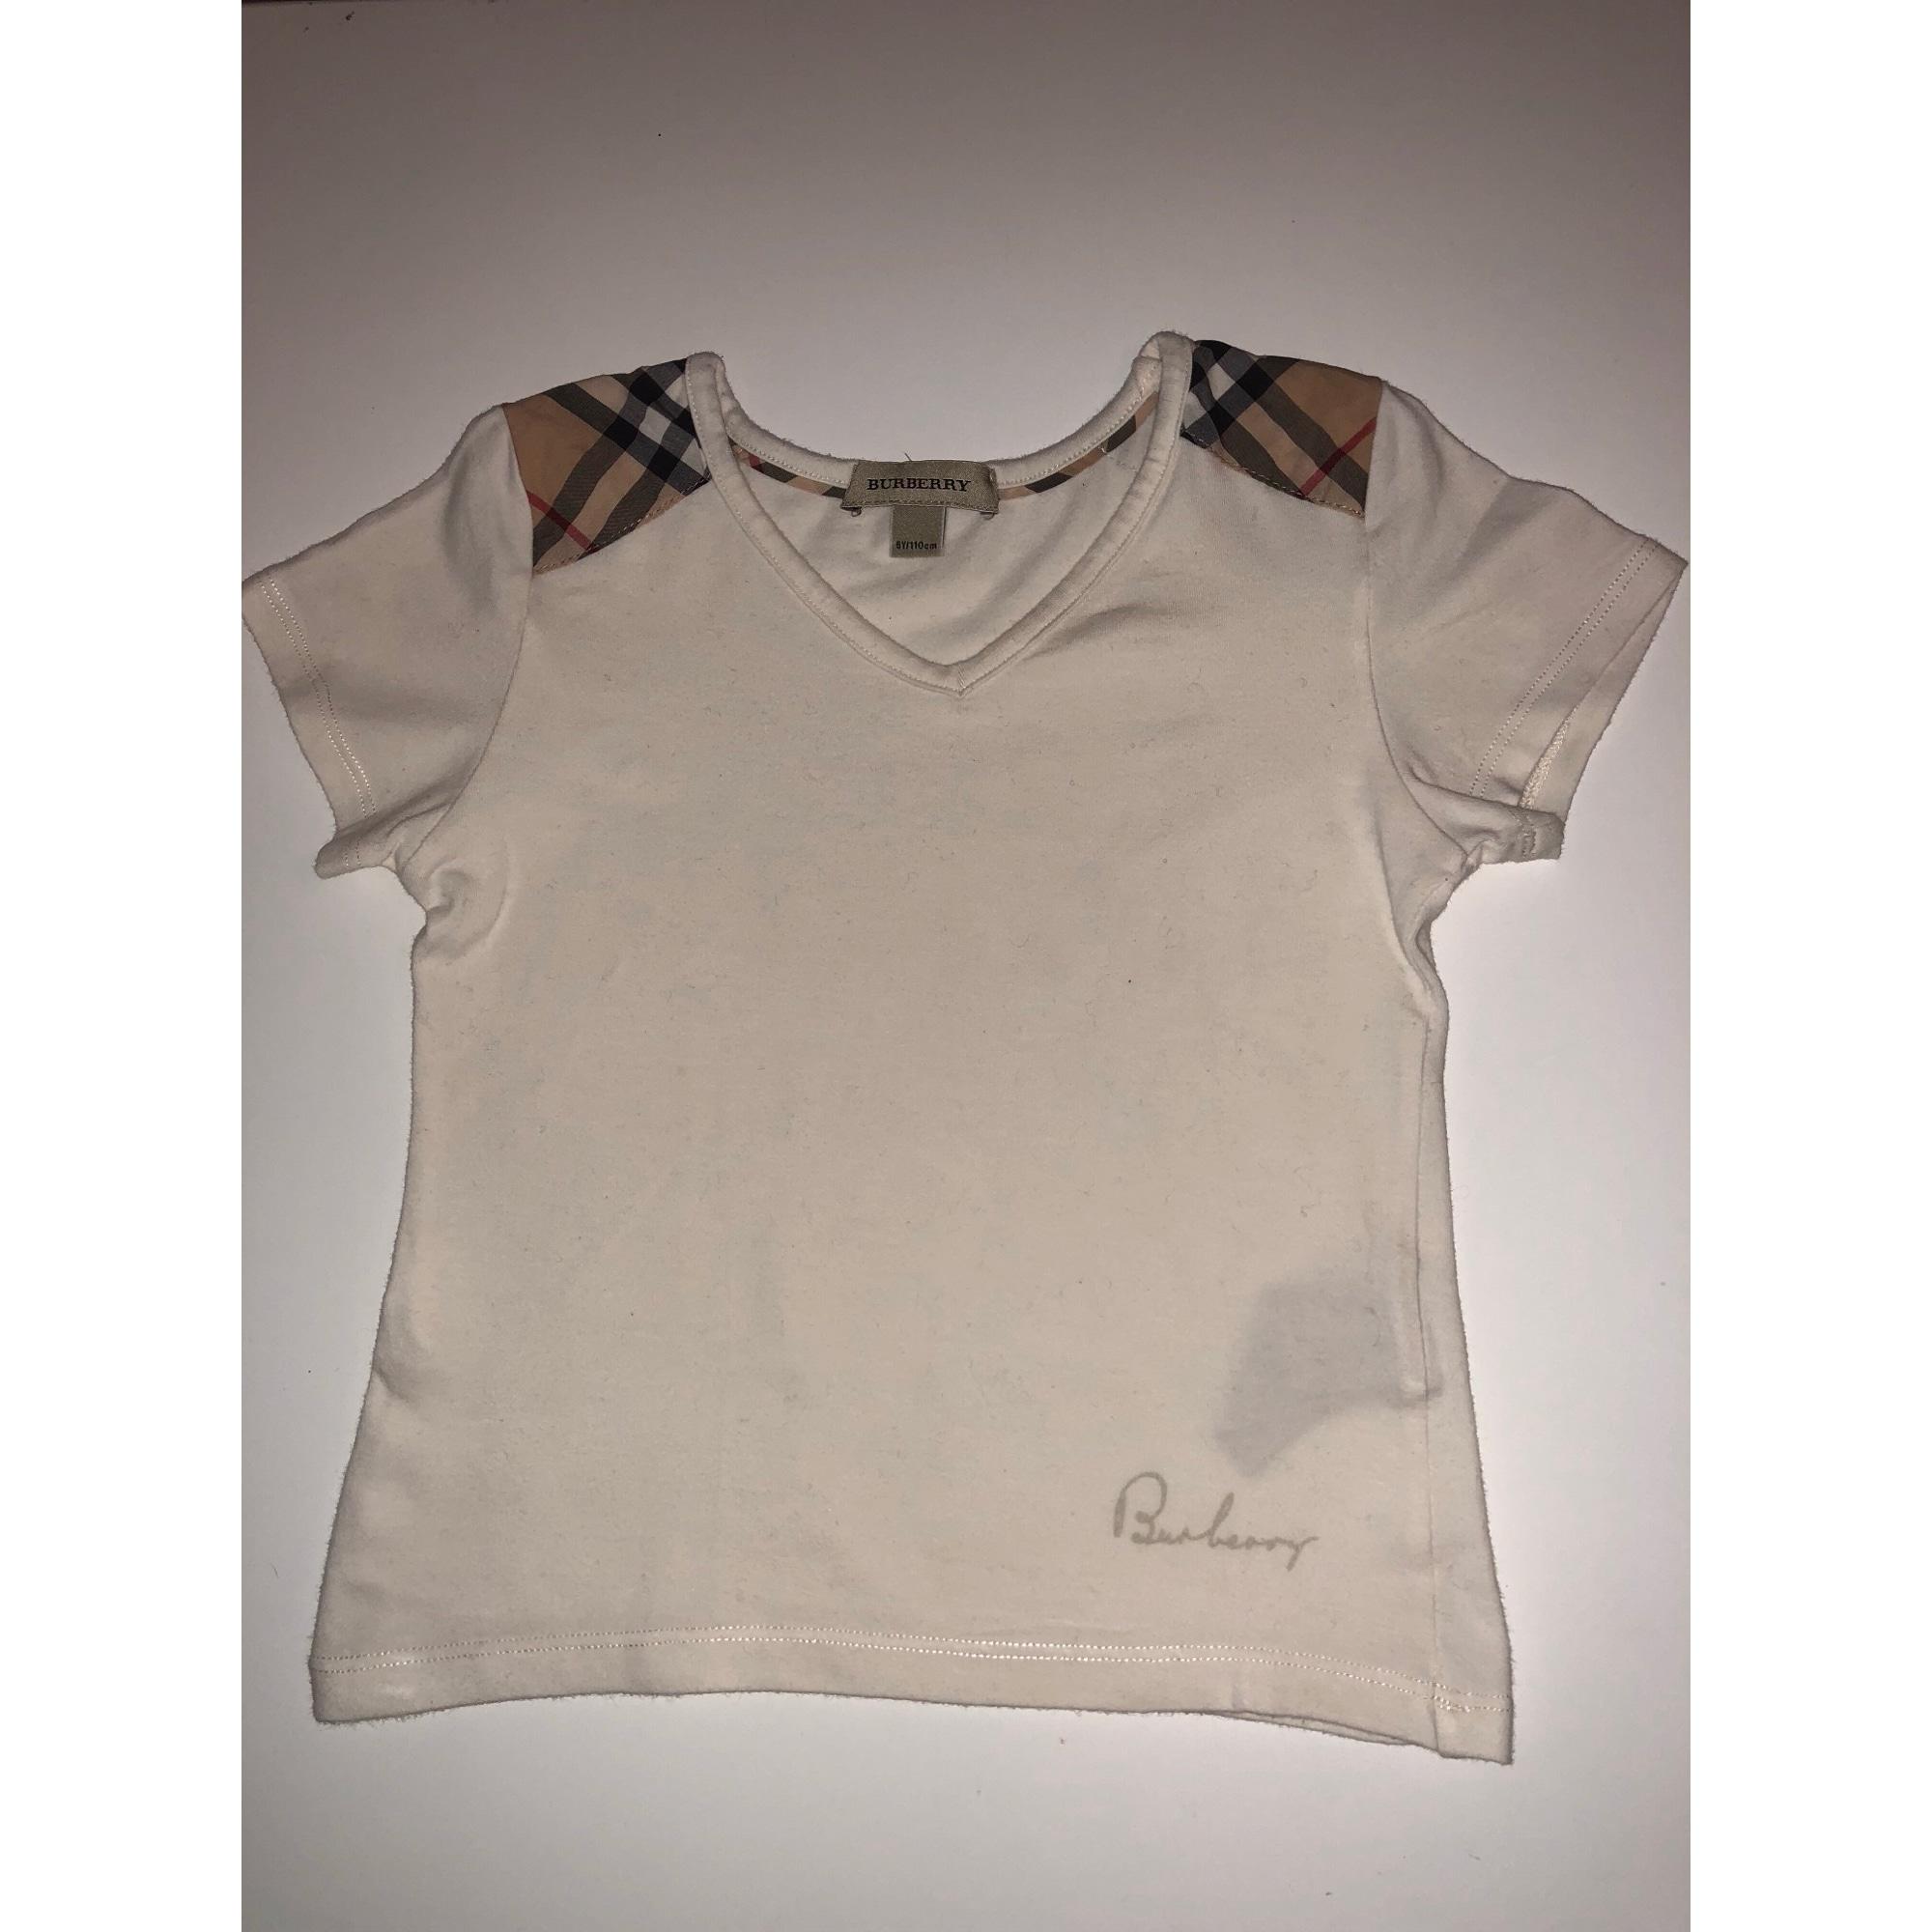 Converse Homme CORE SEASONAL TEE Kaki 4629838 T shirts